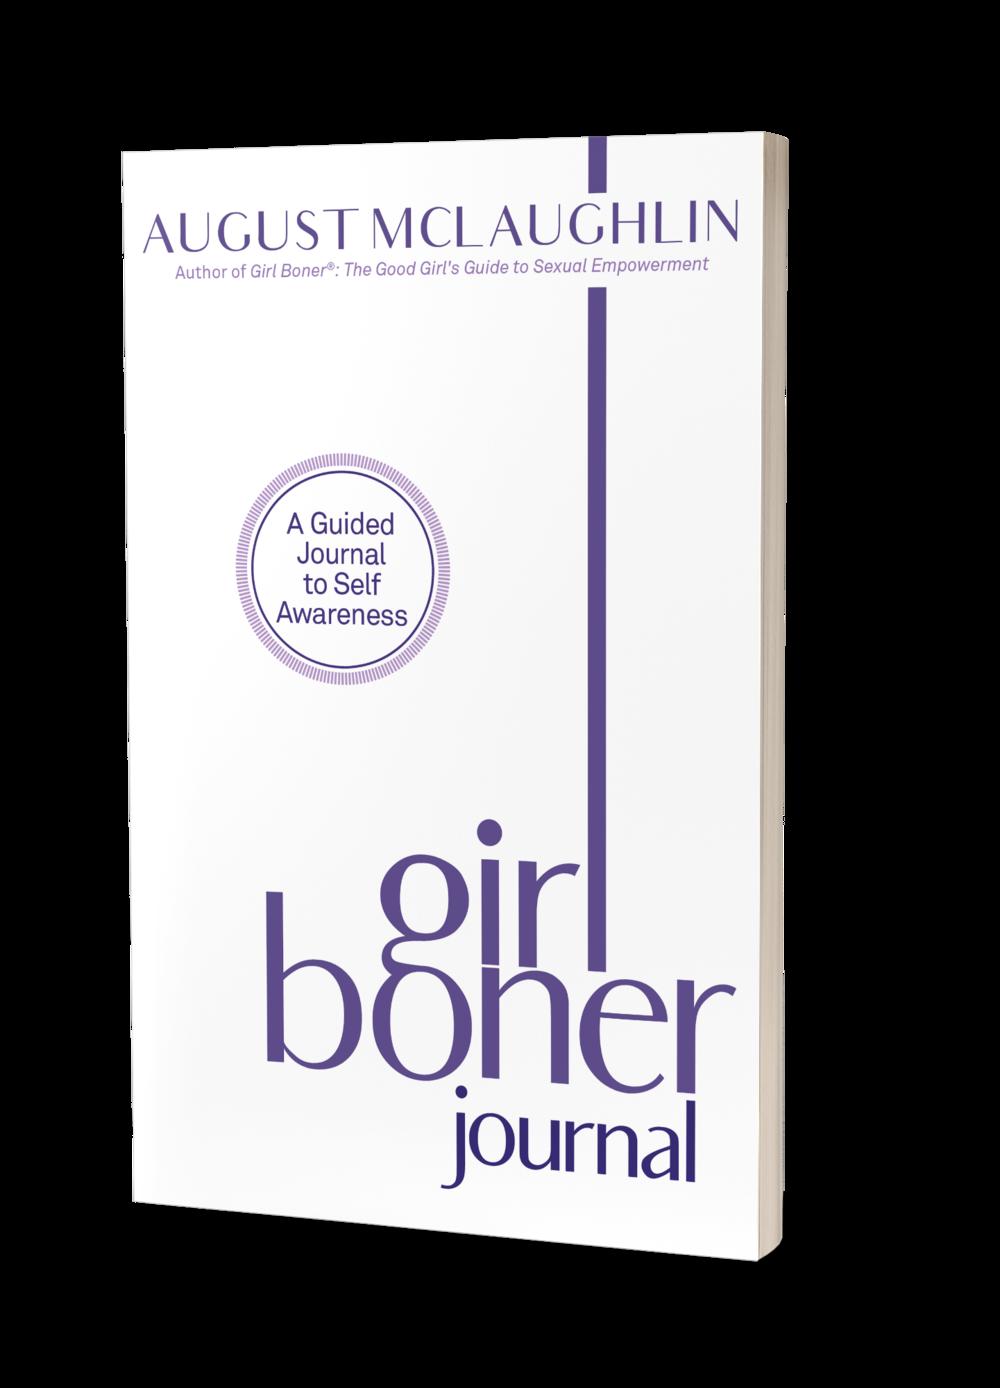 Girl Boner journal book cover, white background, purple writing,